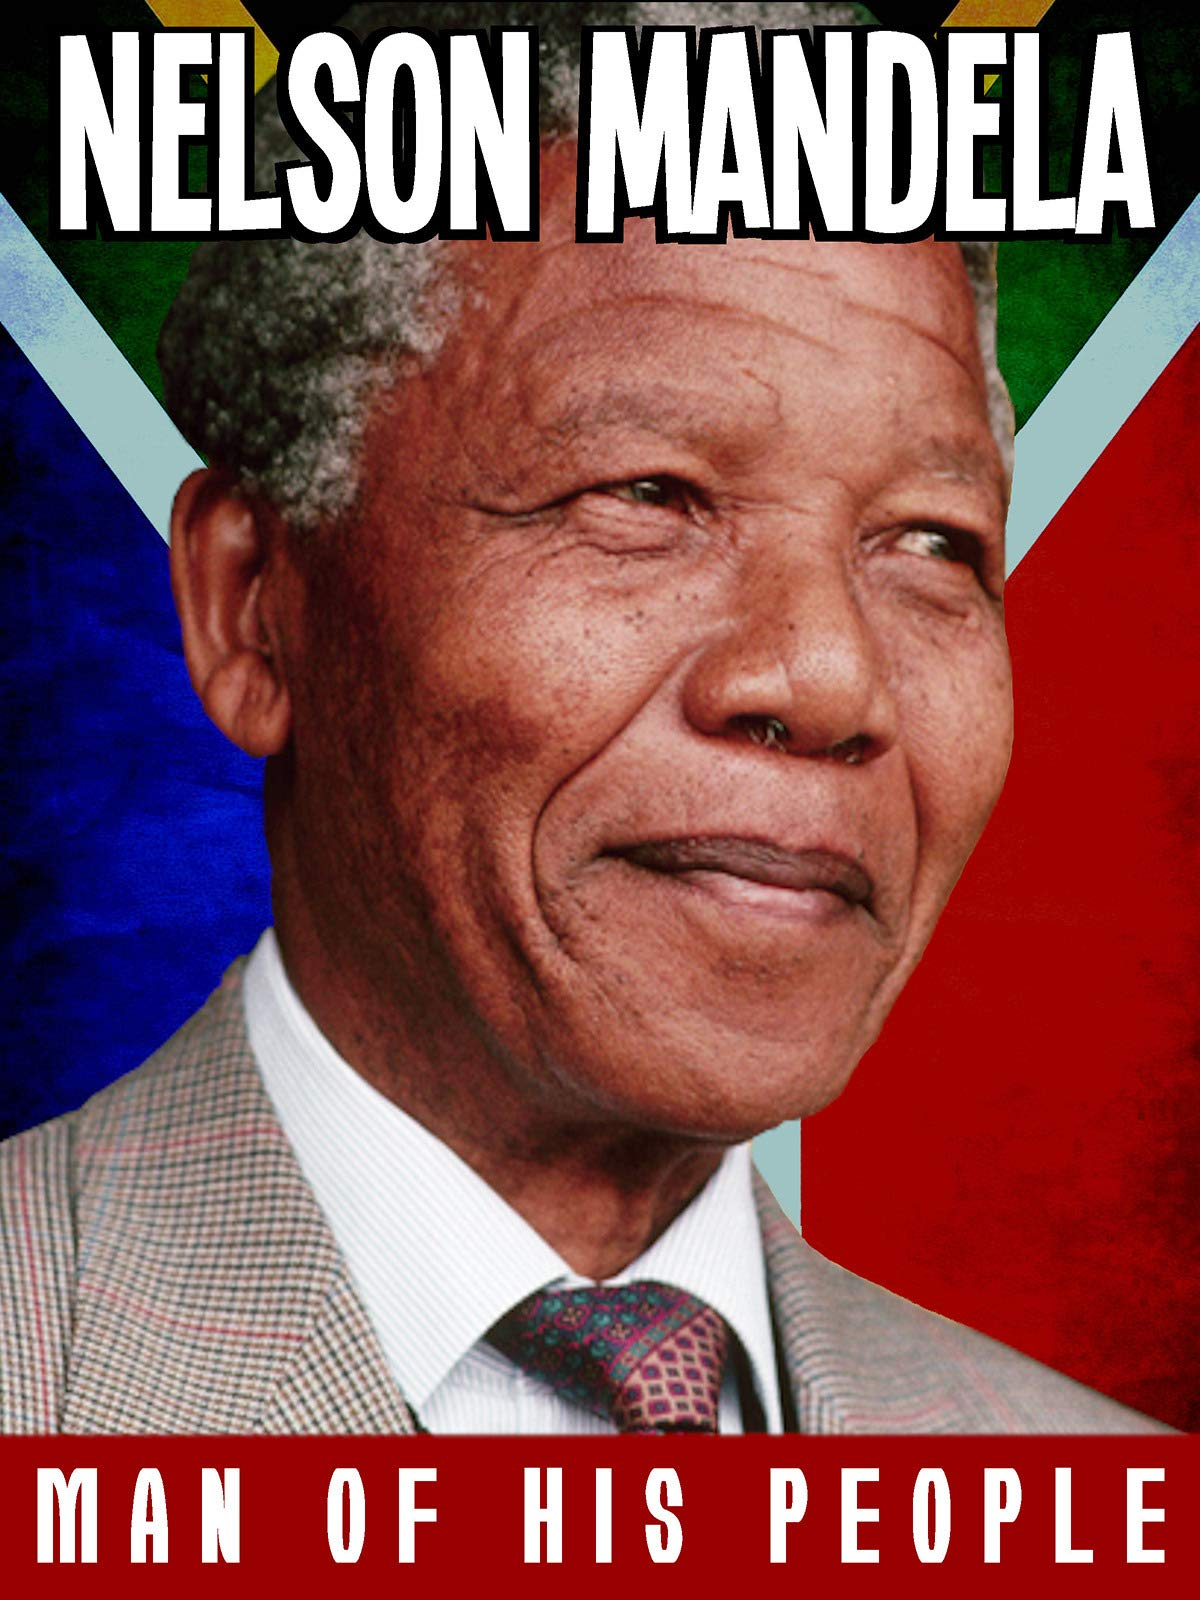 Nelson Mandela Man Of His People